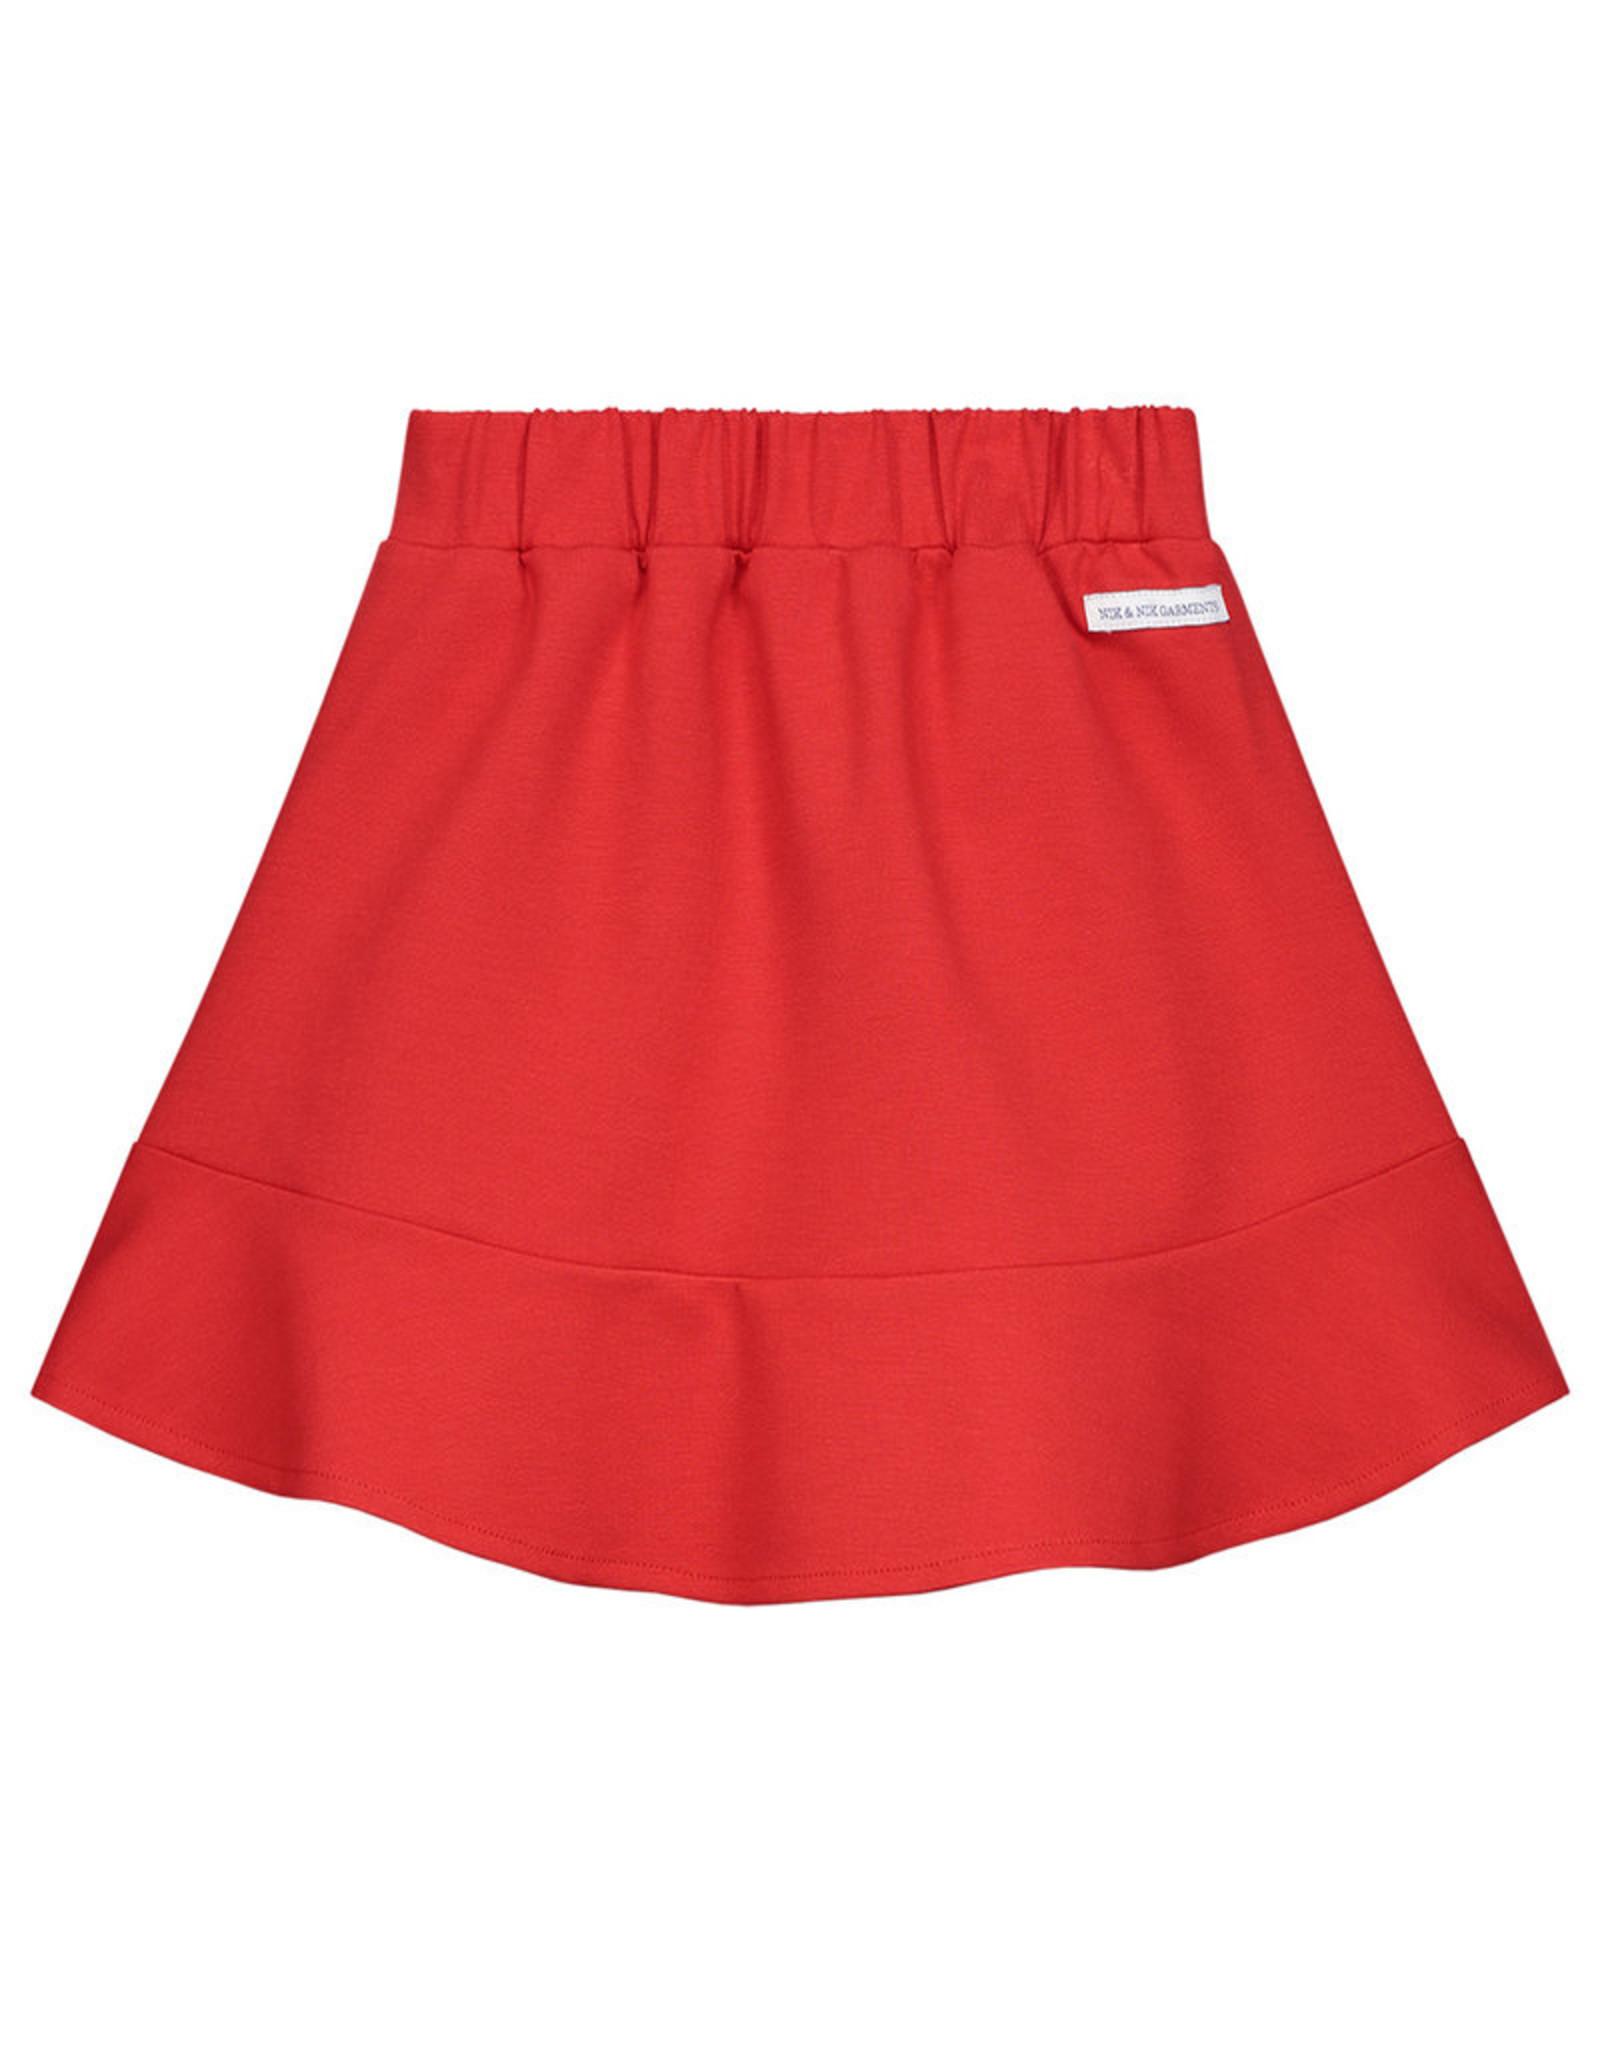 NIK & NIK Girls Skirt Cleo maat 164